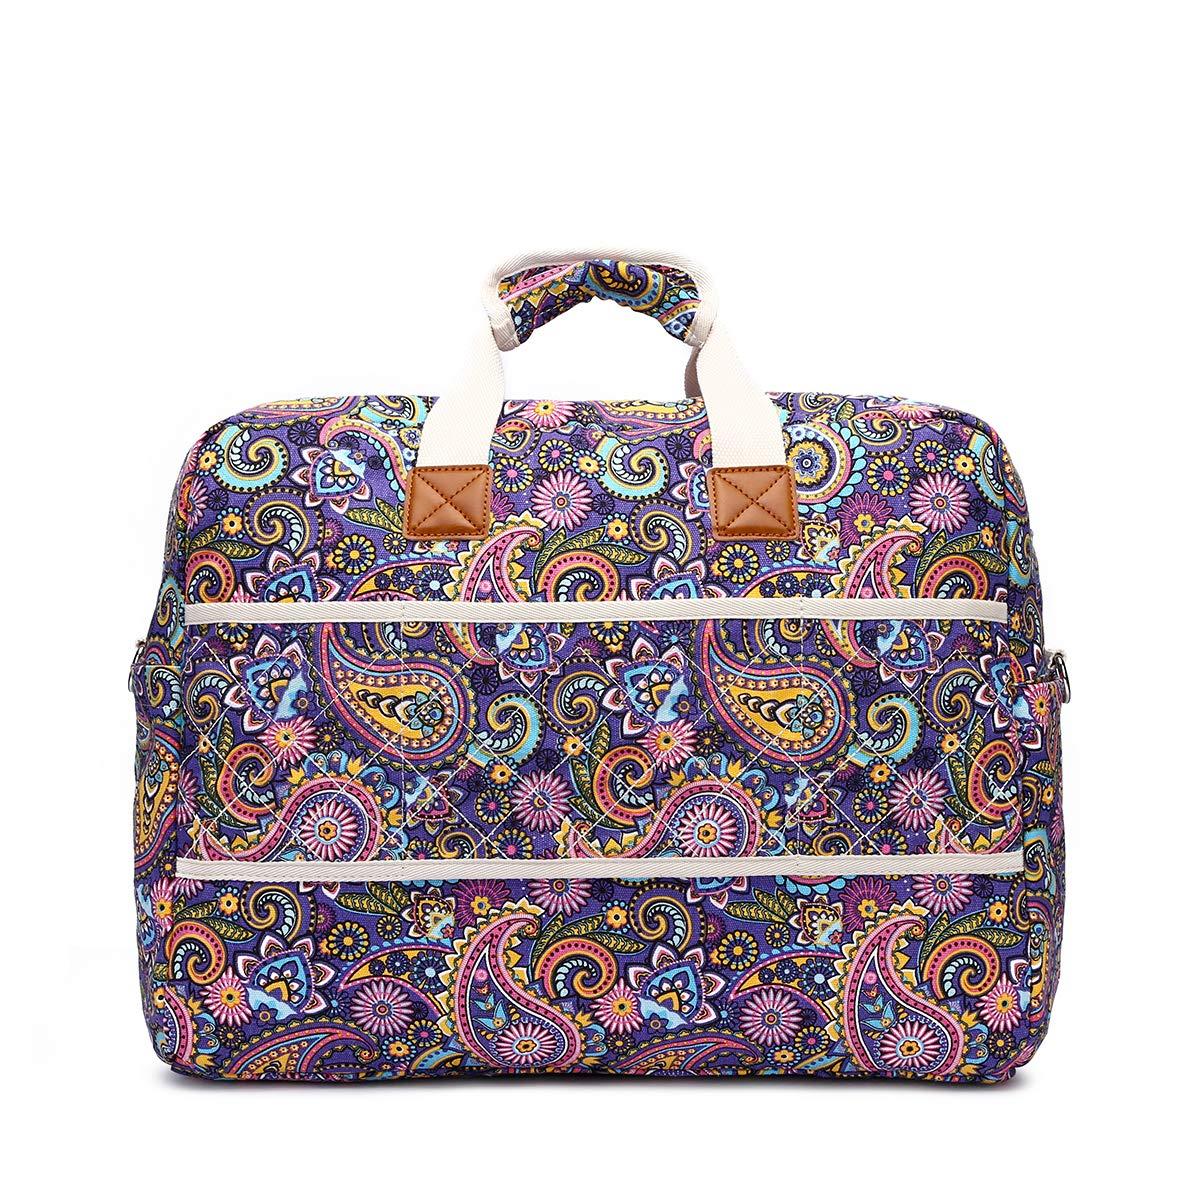 Malirona Women's Canvas Overnight Weekender Bag Carry On Travel Duffel Tote Bag Bohemian Flower (Purple Flower) by Malirona (Image #4)